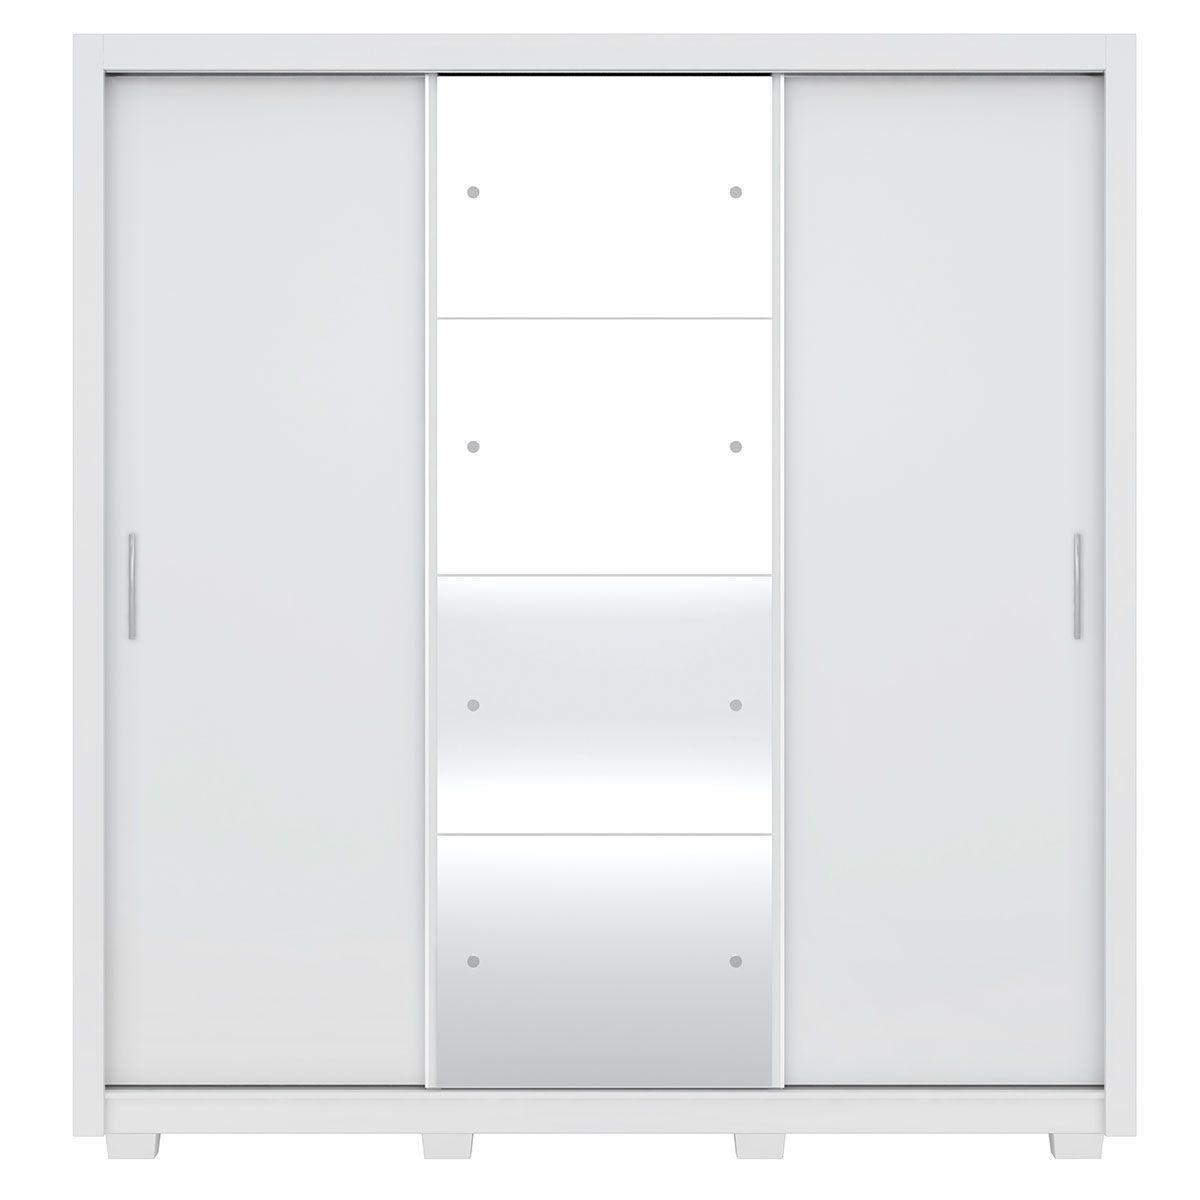 Guarda-Roupa Residence II 3 Portas de Correr com Pés Branco